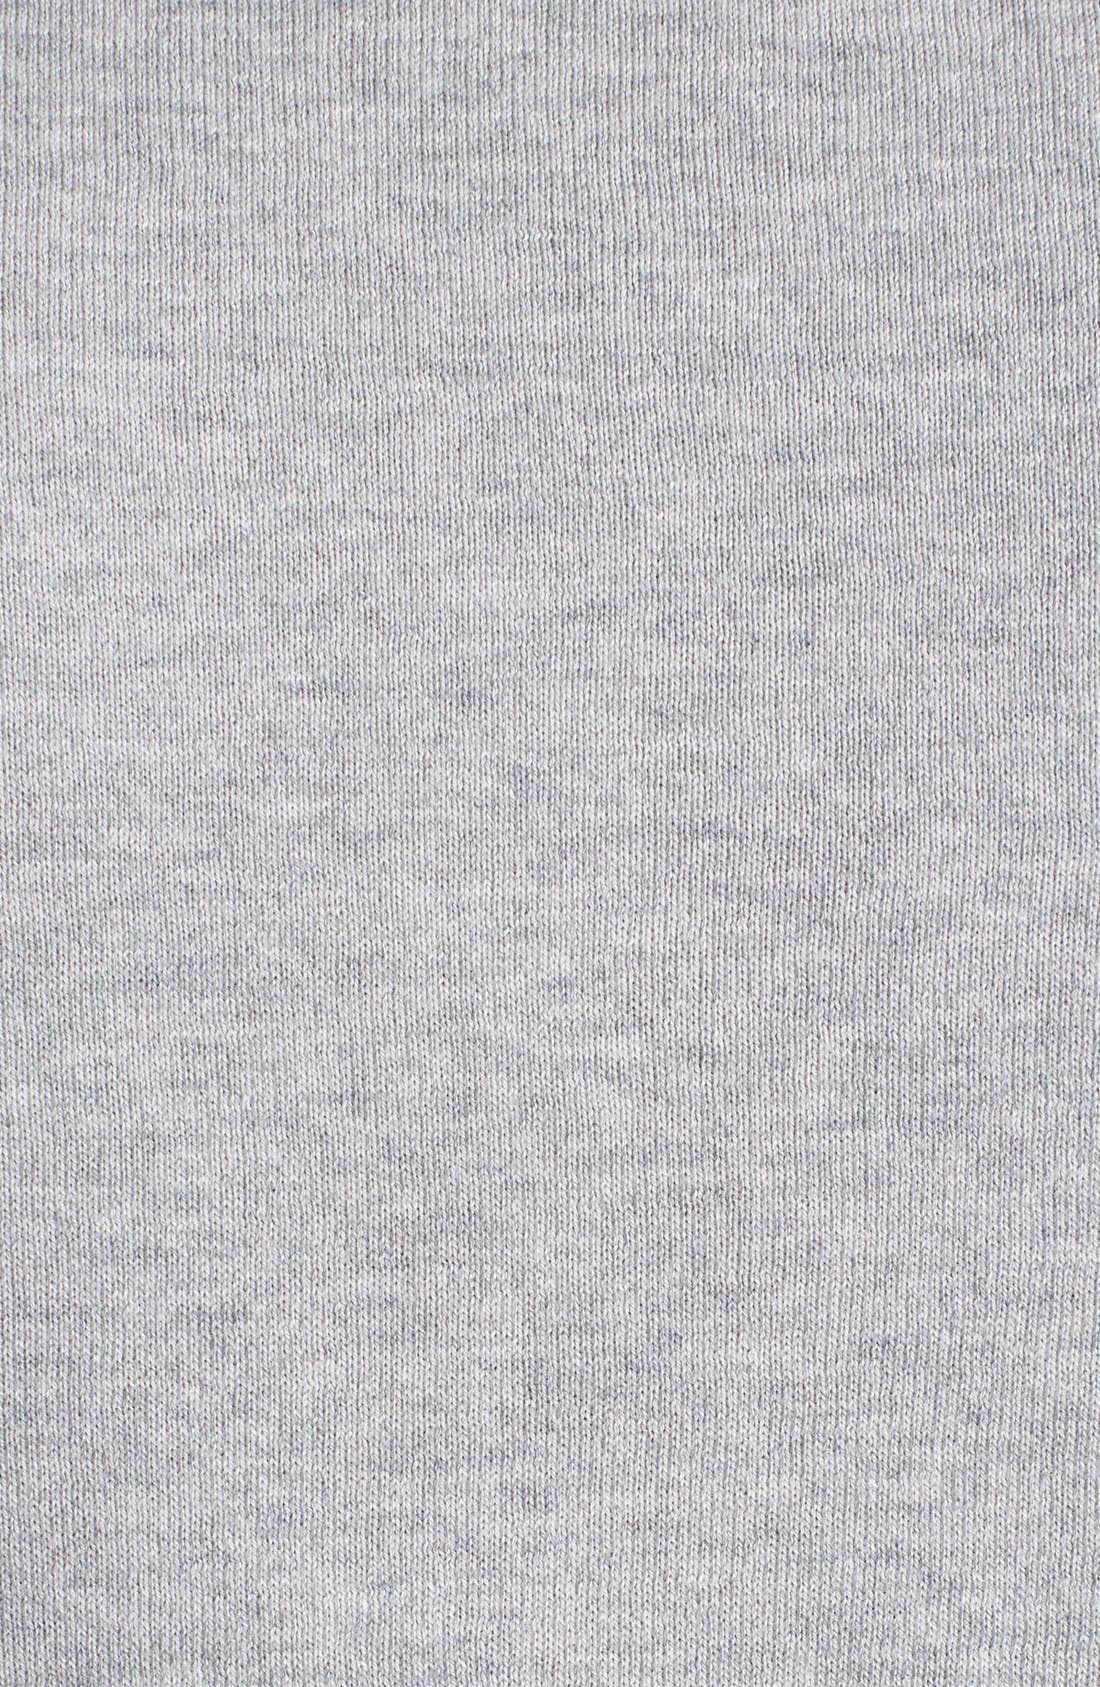 Alternate Image 3  - Burberry Brit 'Rubin' Polo